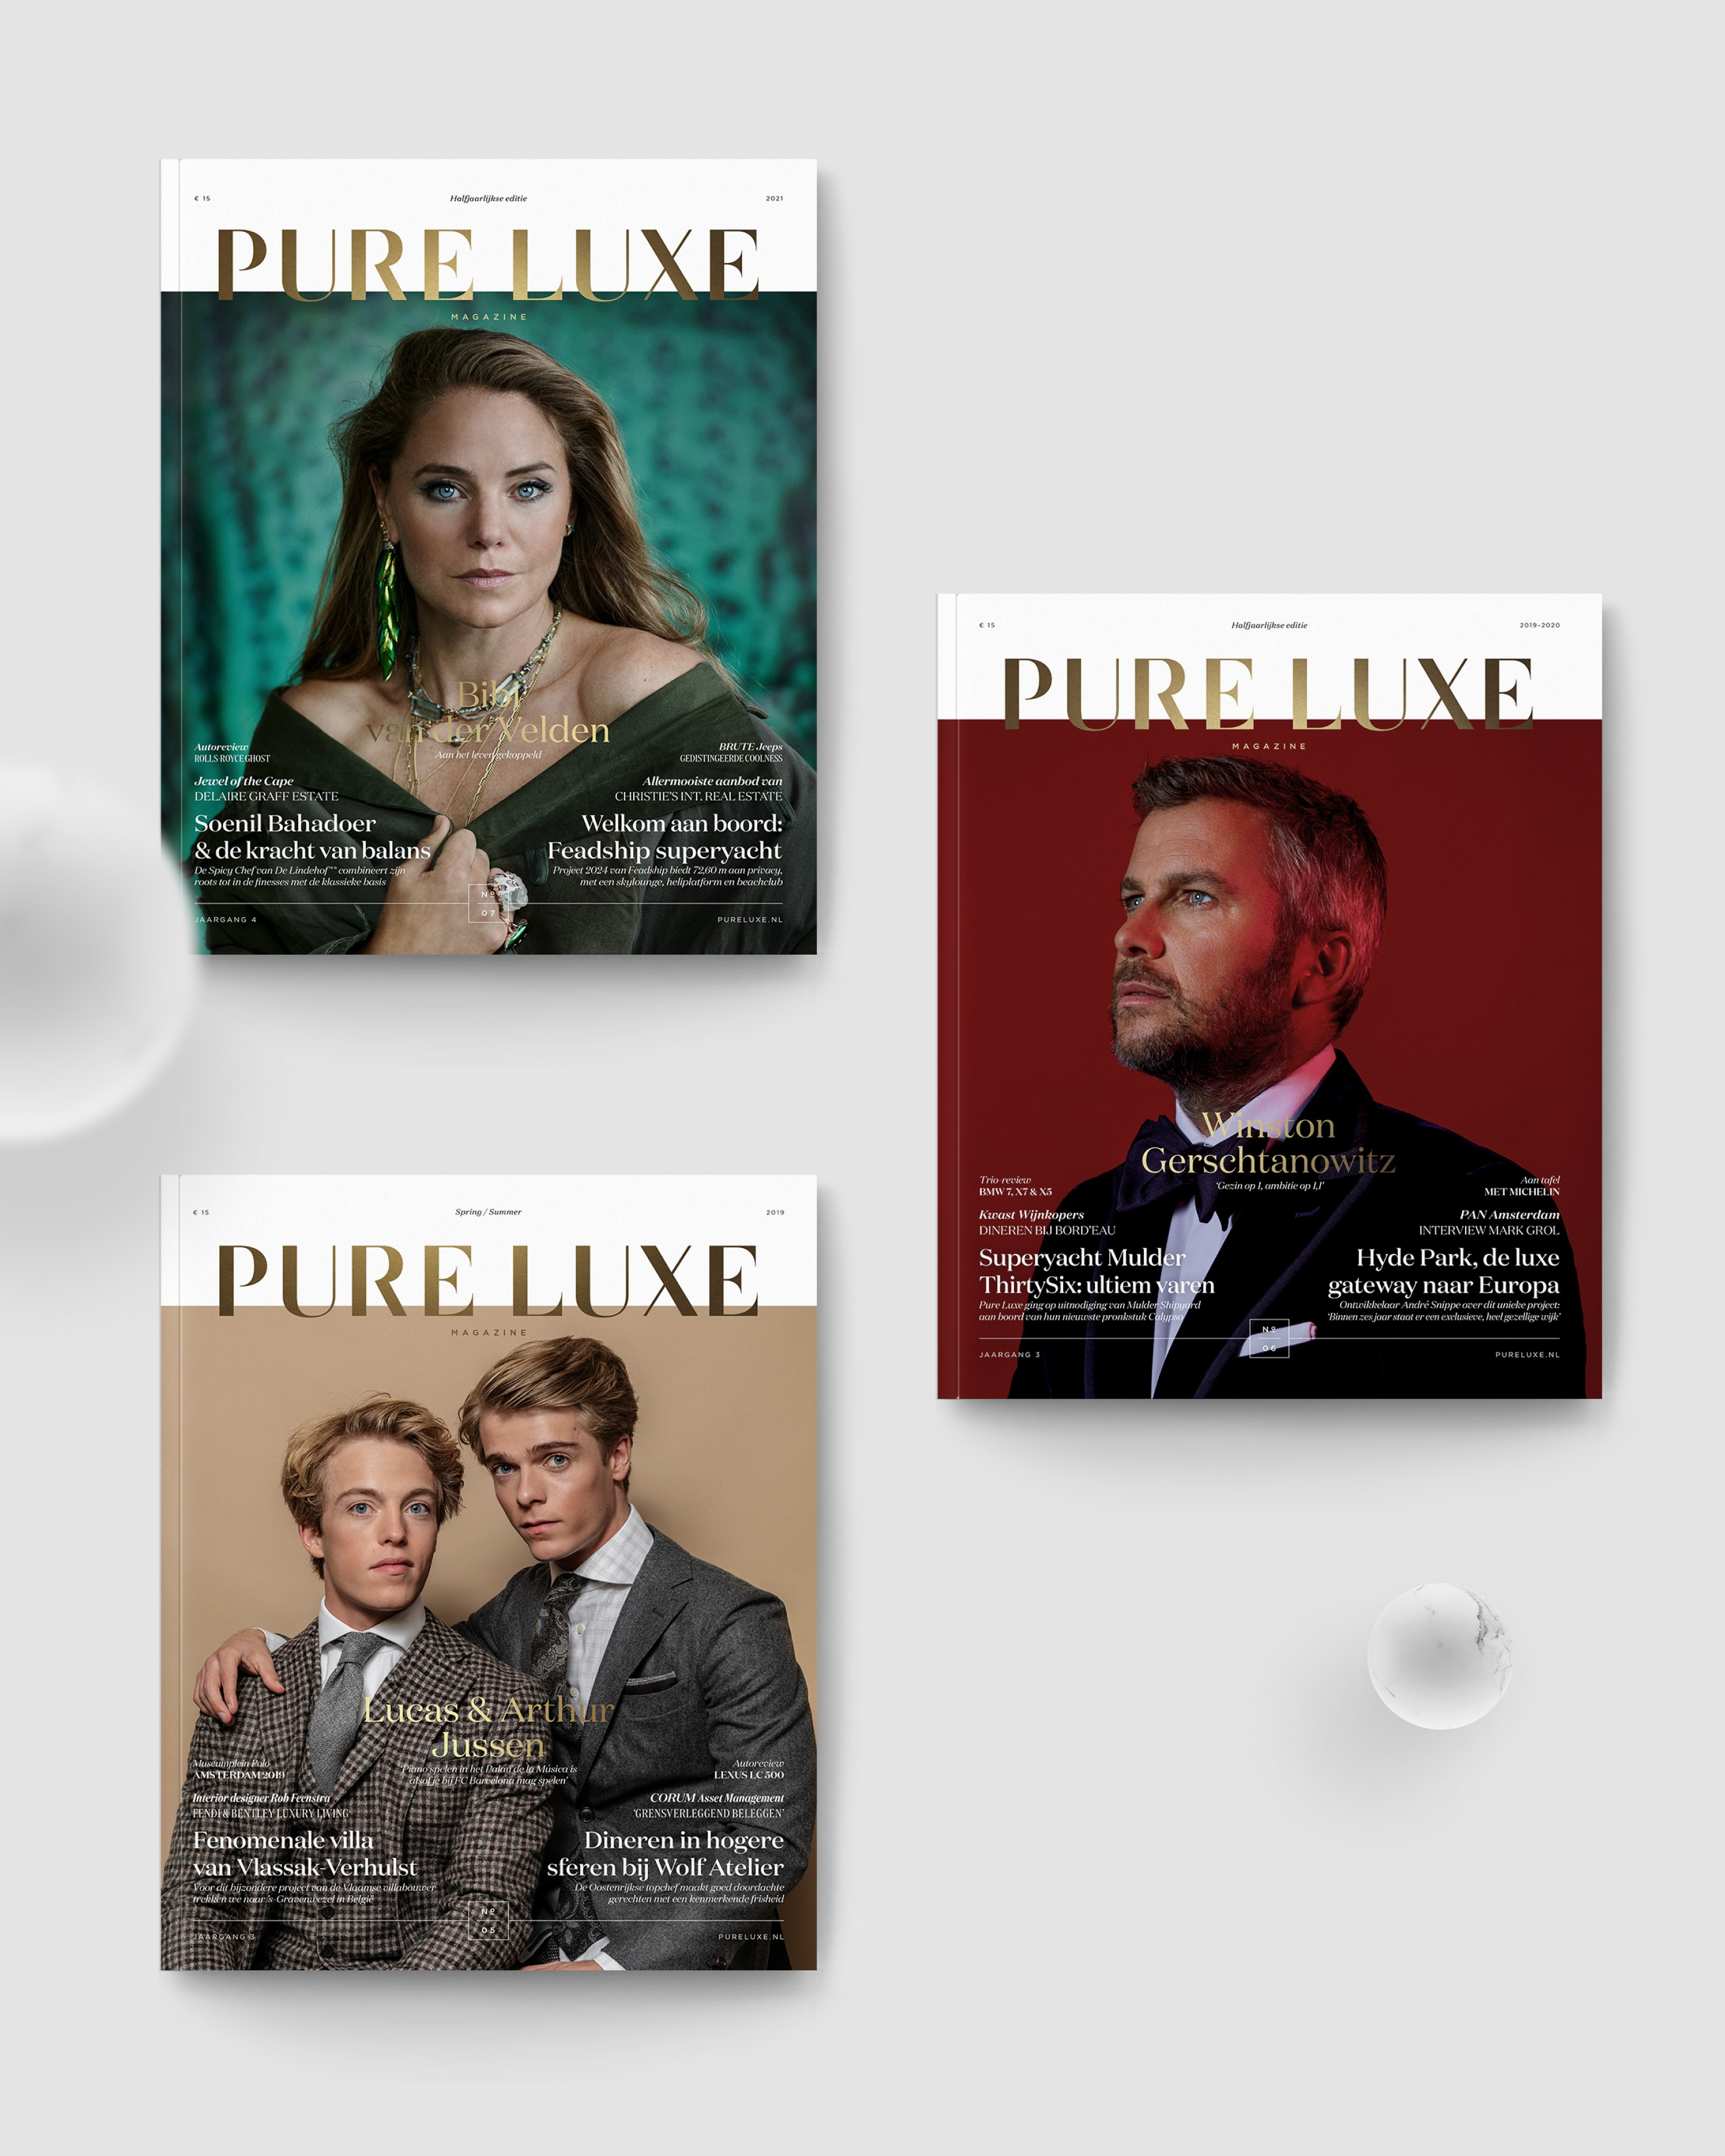 PL-Print-Magazine-1-2